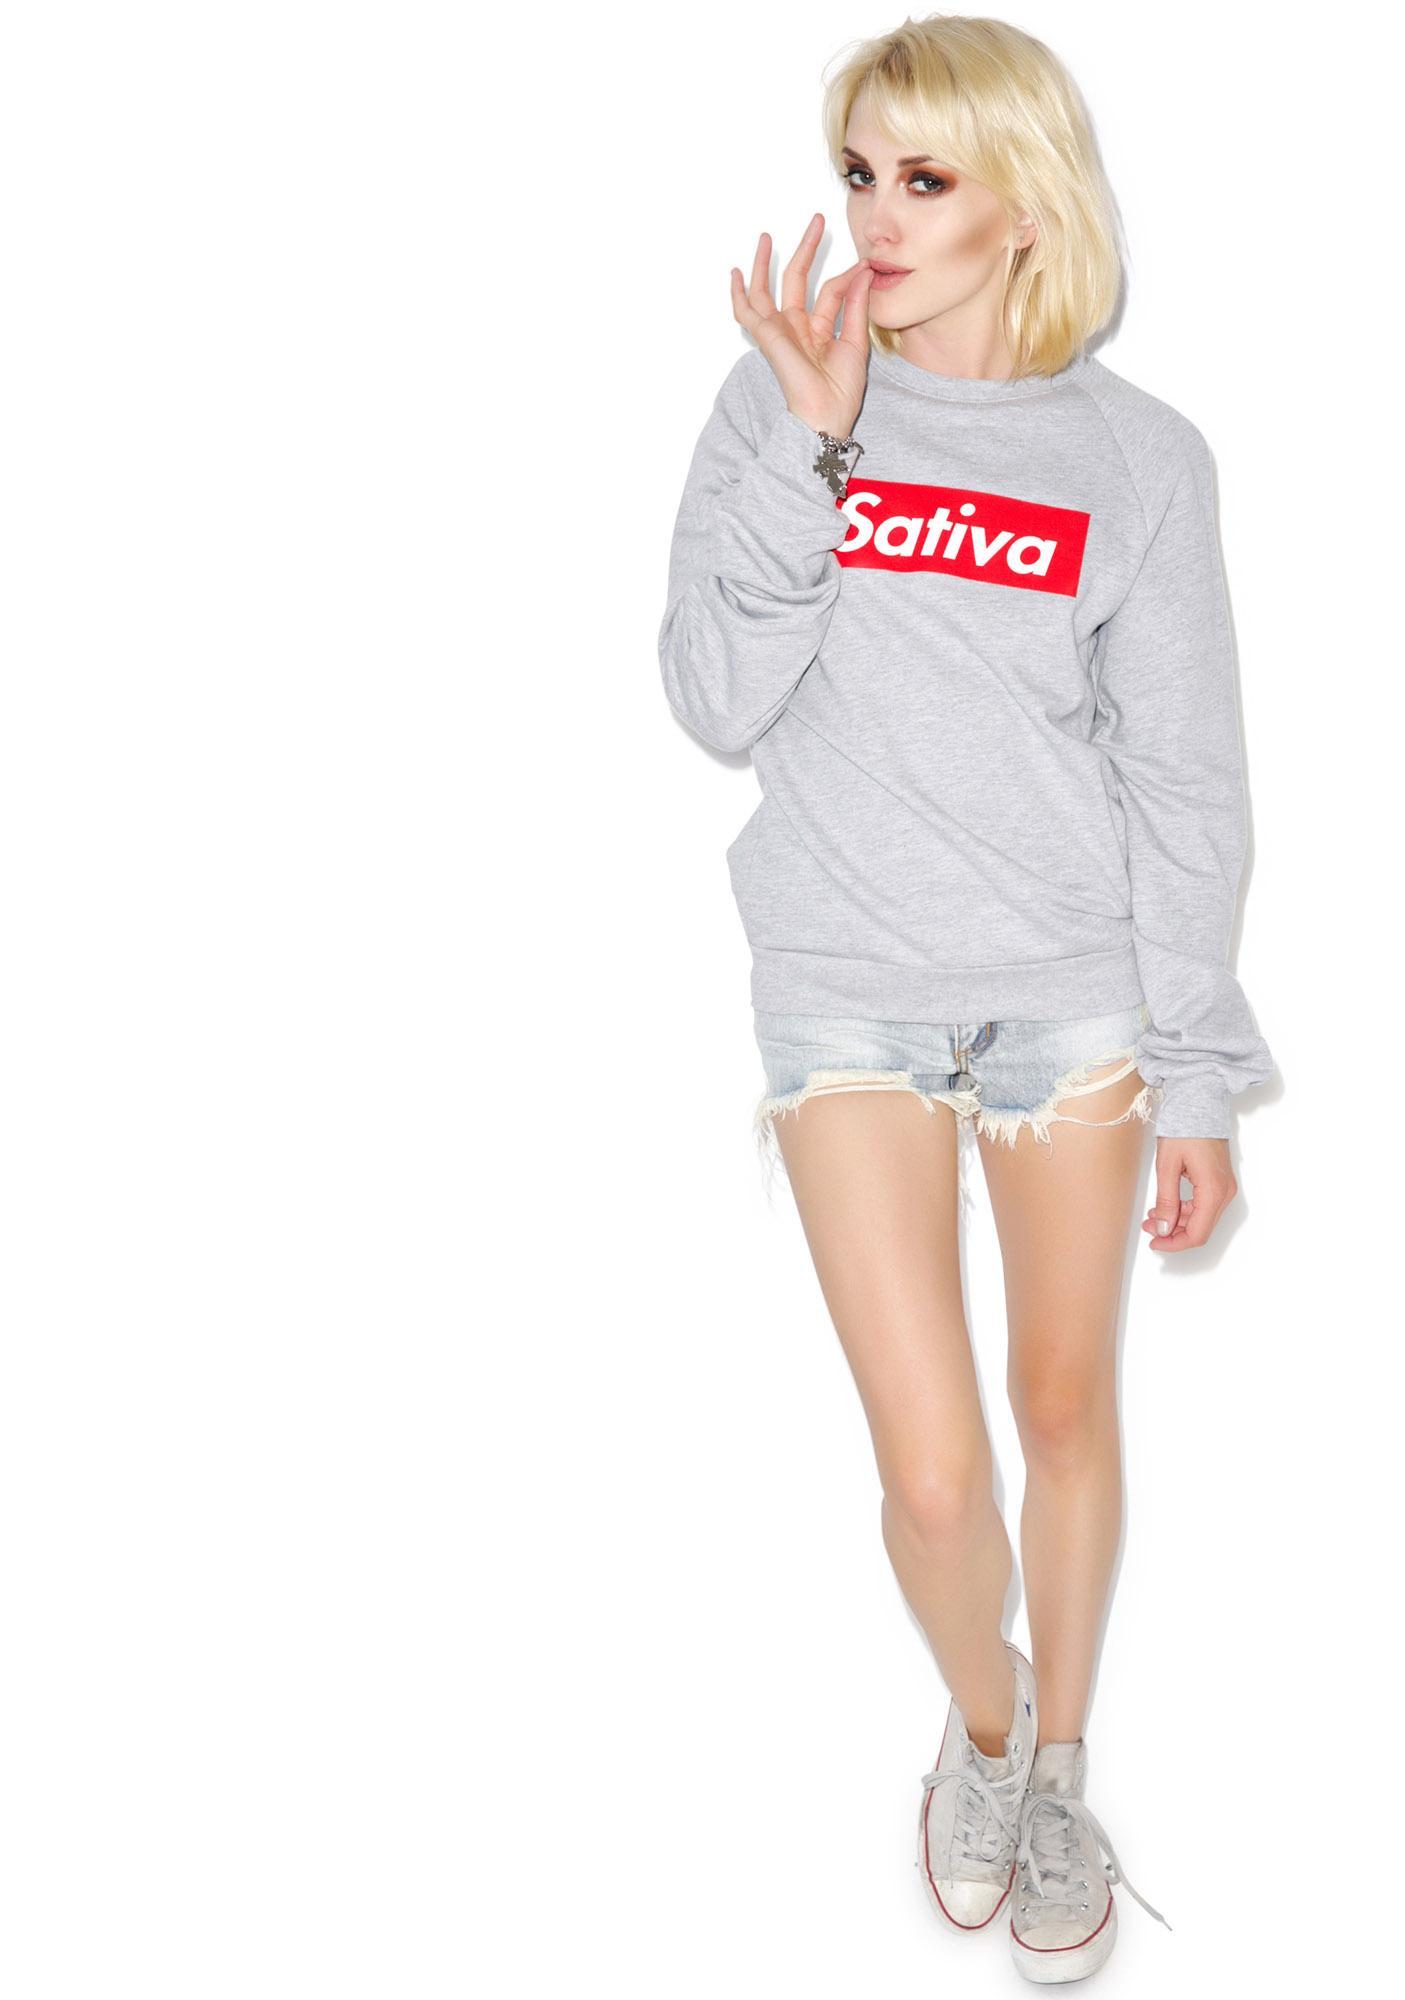 MeYouVersusLife Sativa Crewneck Sweatshirt